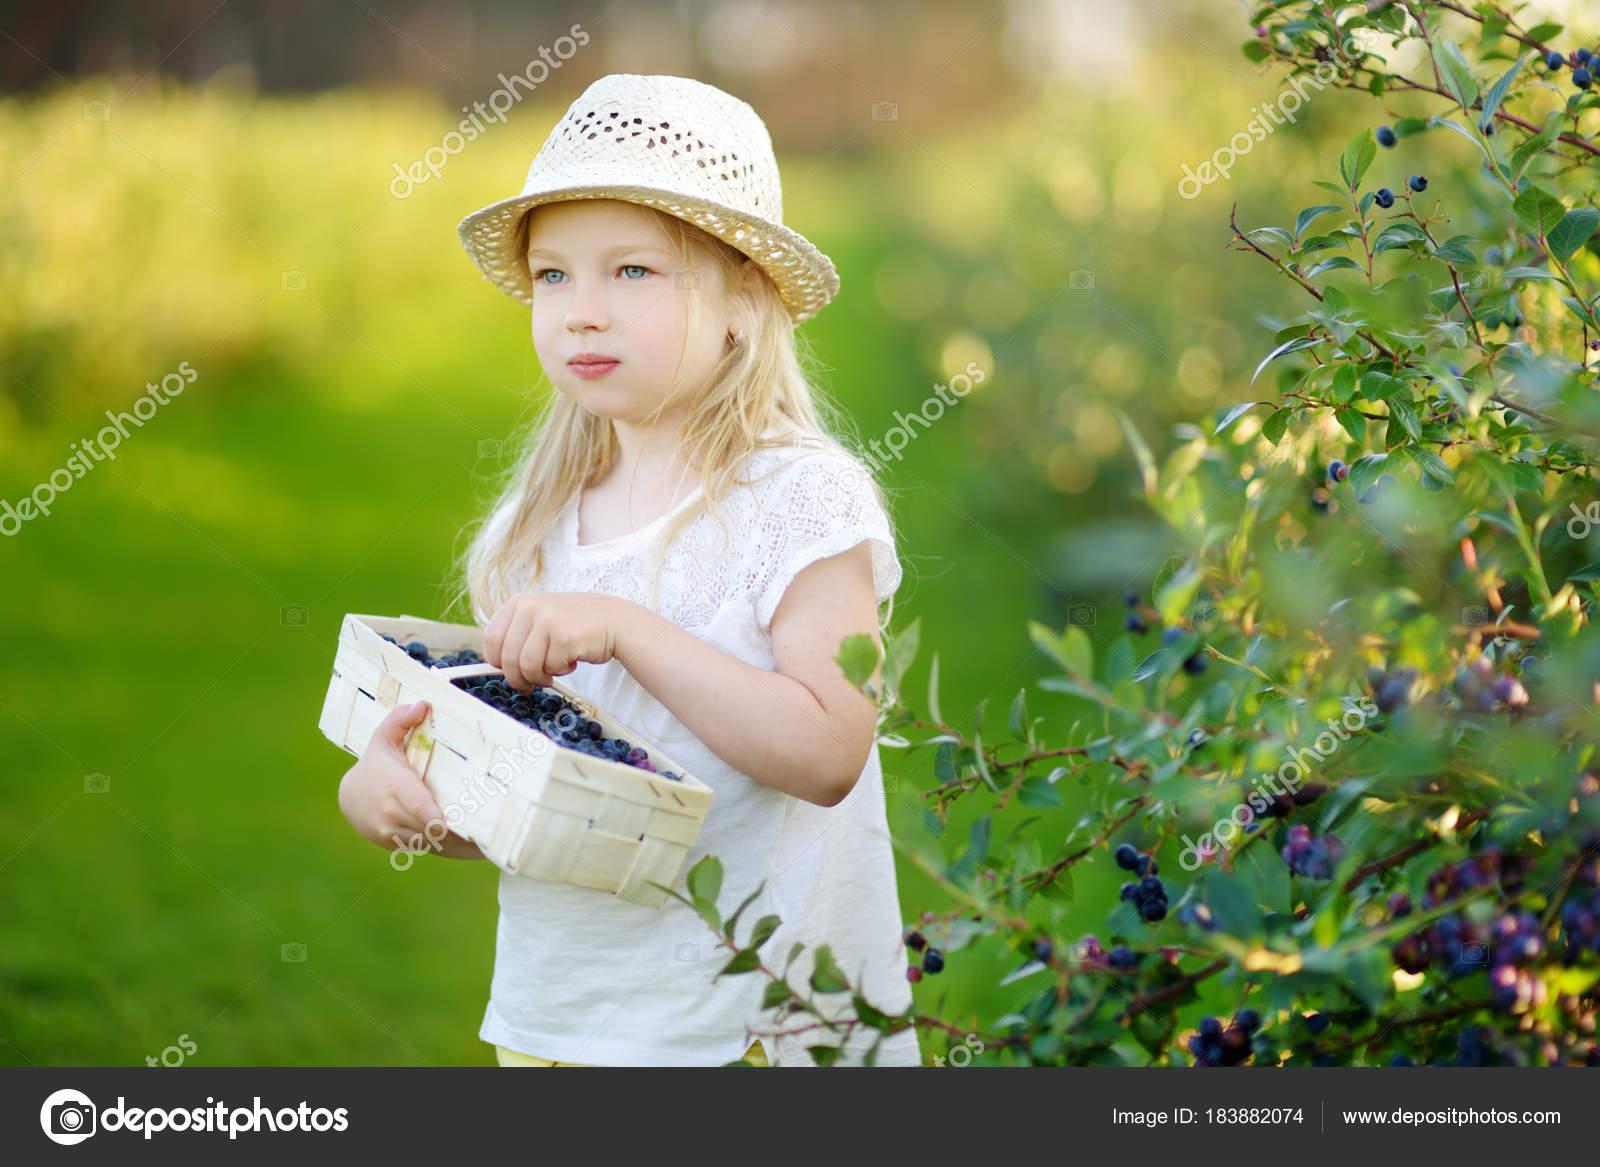 cute little girl picking fresh berries organic blueberry farm warm